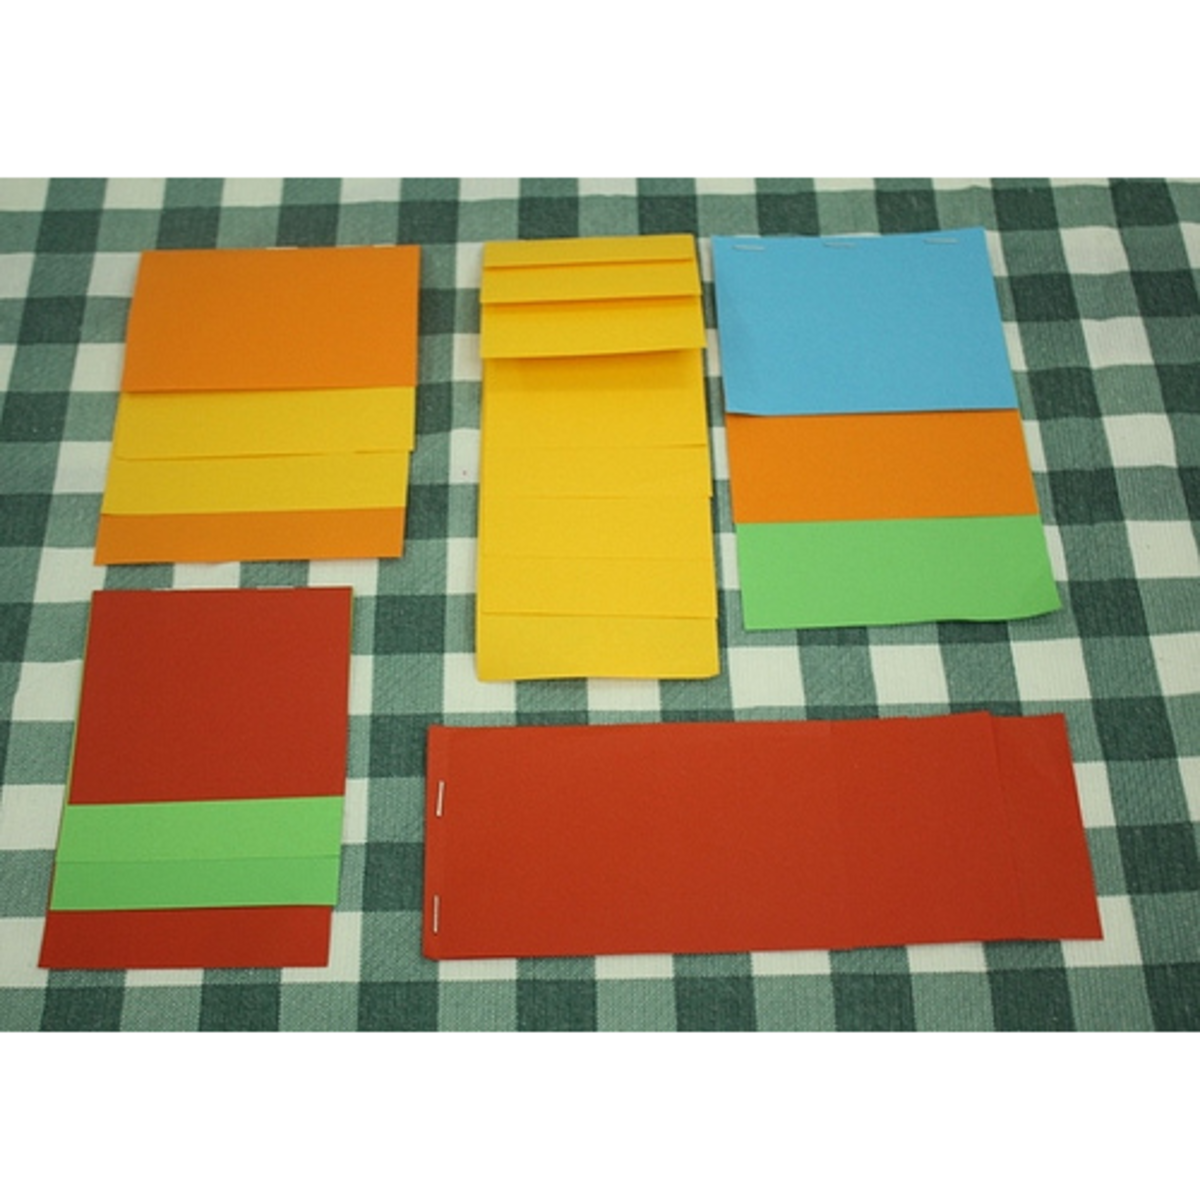 blank layered books